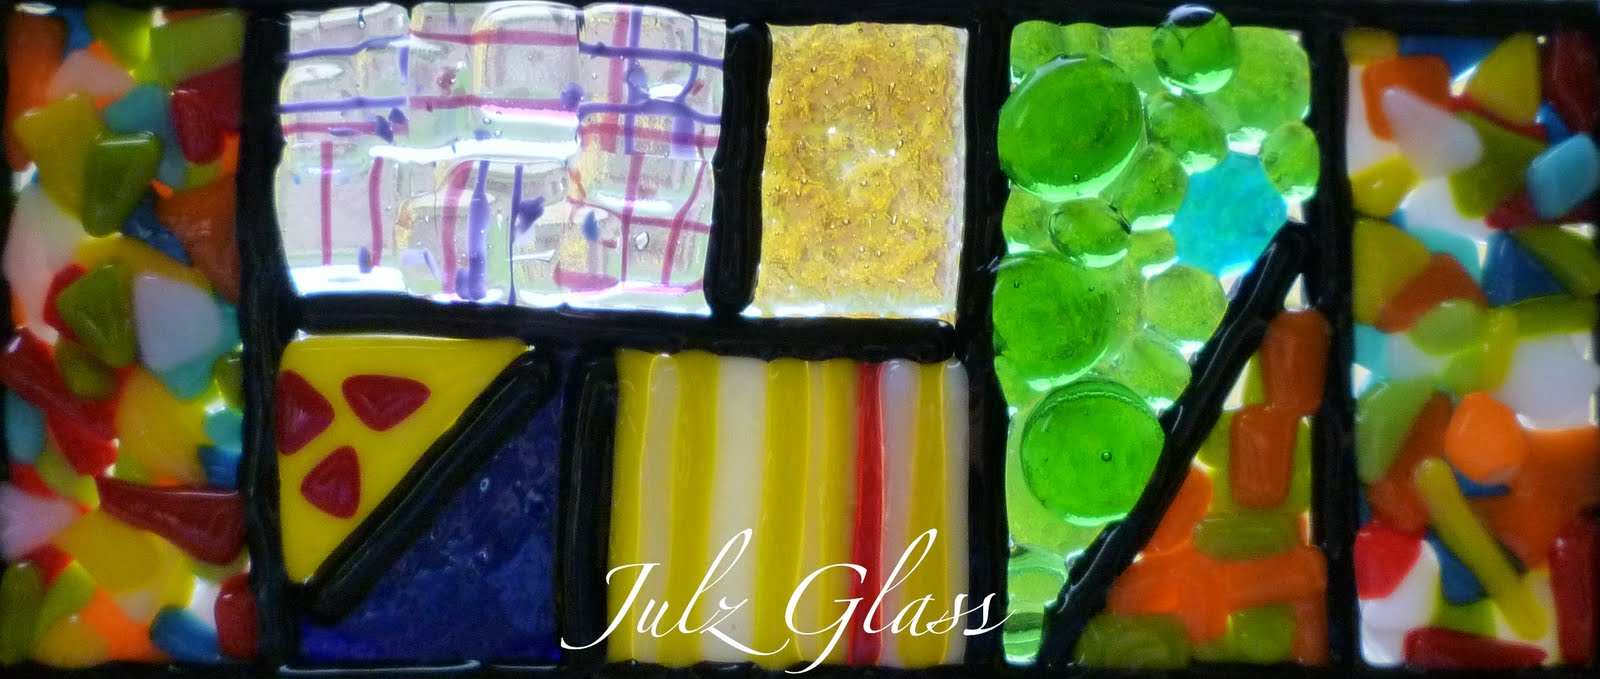 Julz Glass